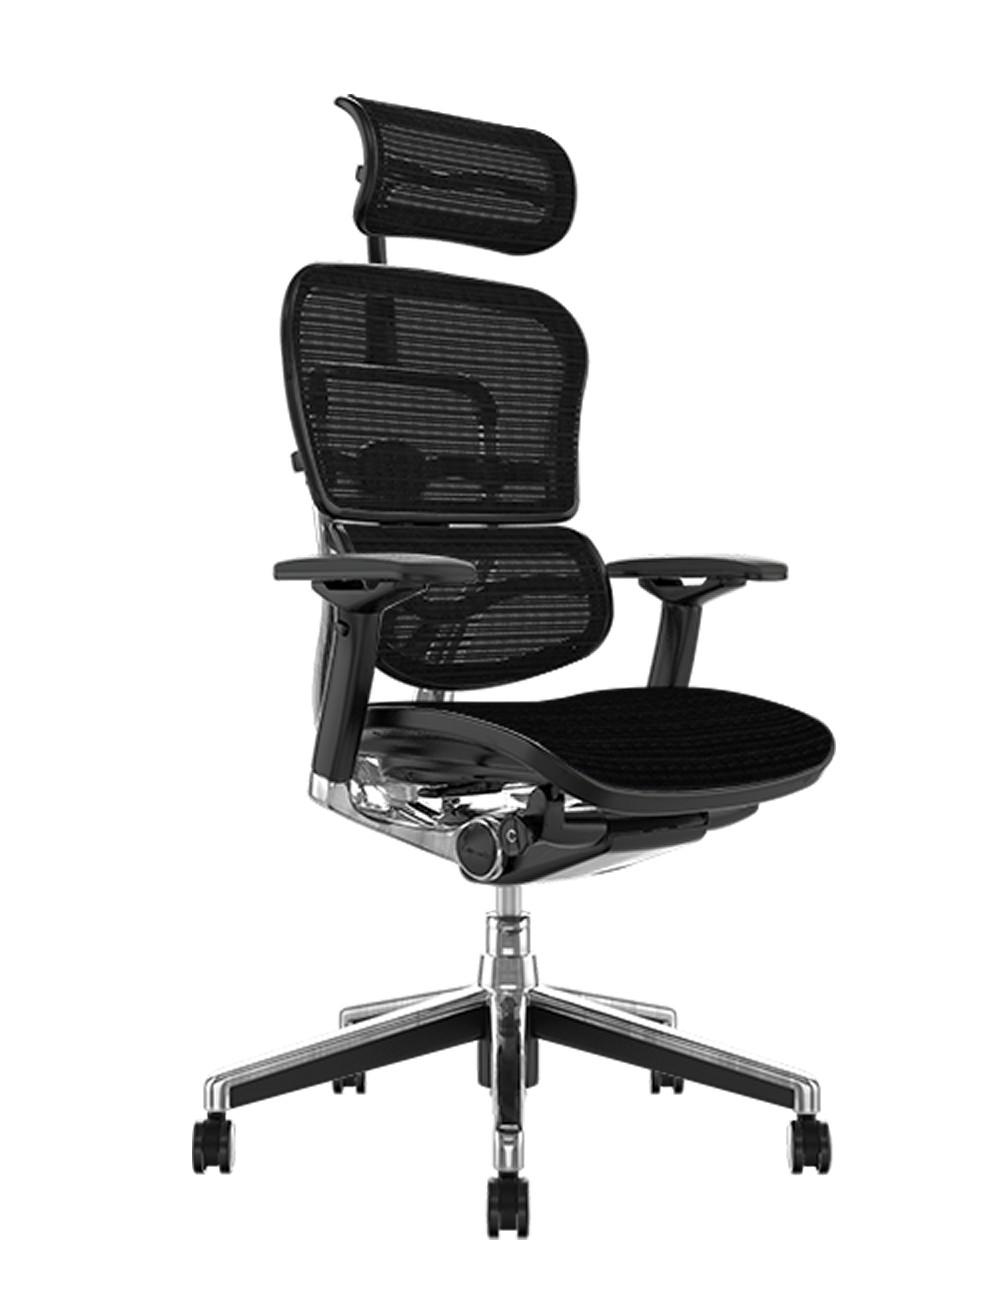 Ergohuman Elite Mesh Office Chair with Headrest